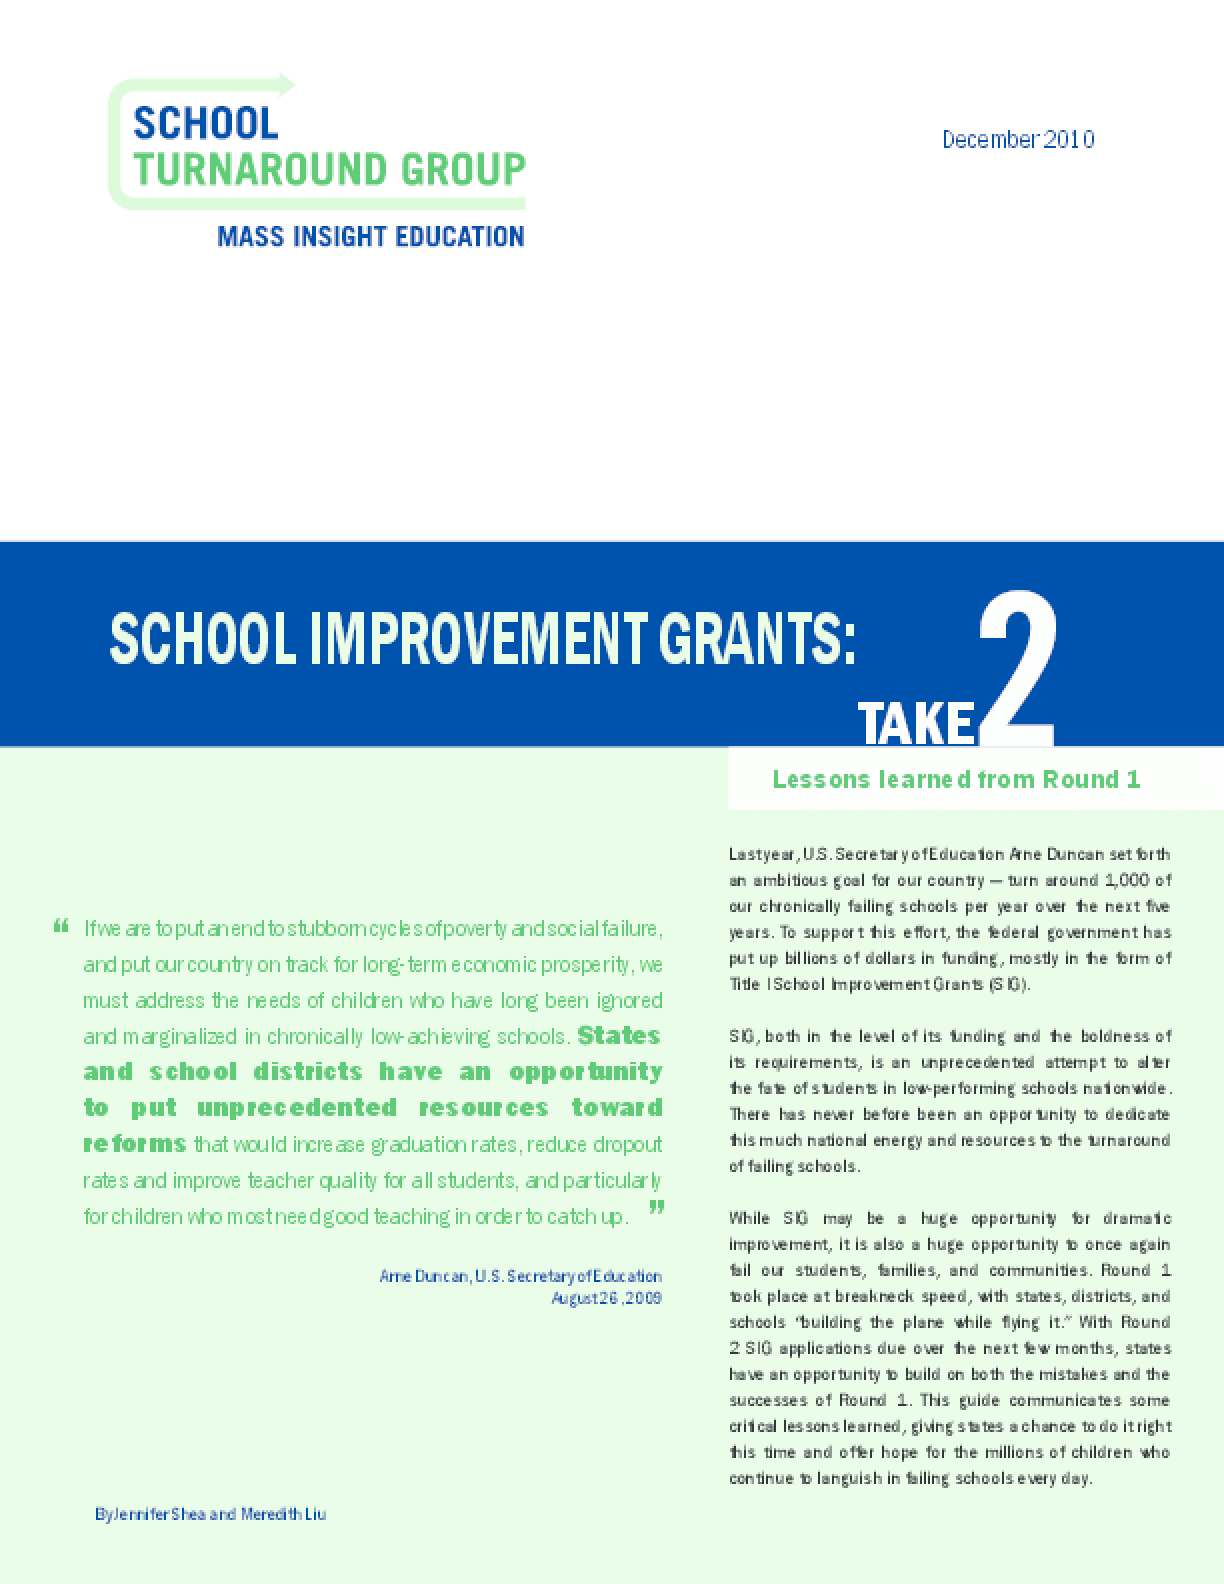 School Improvement Grants: Take 2